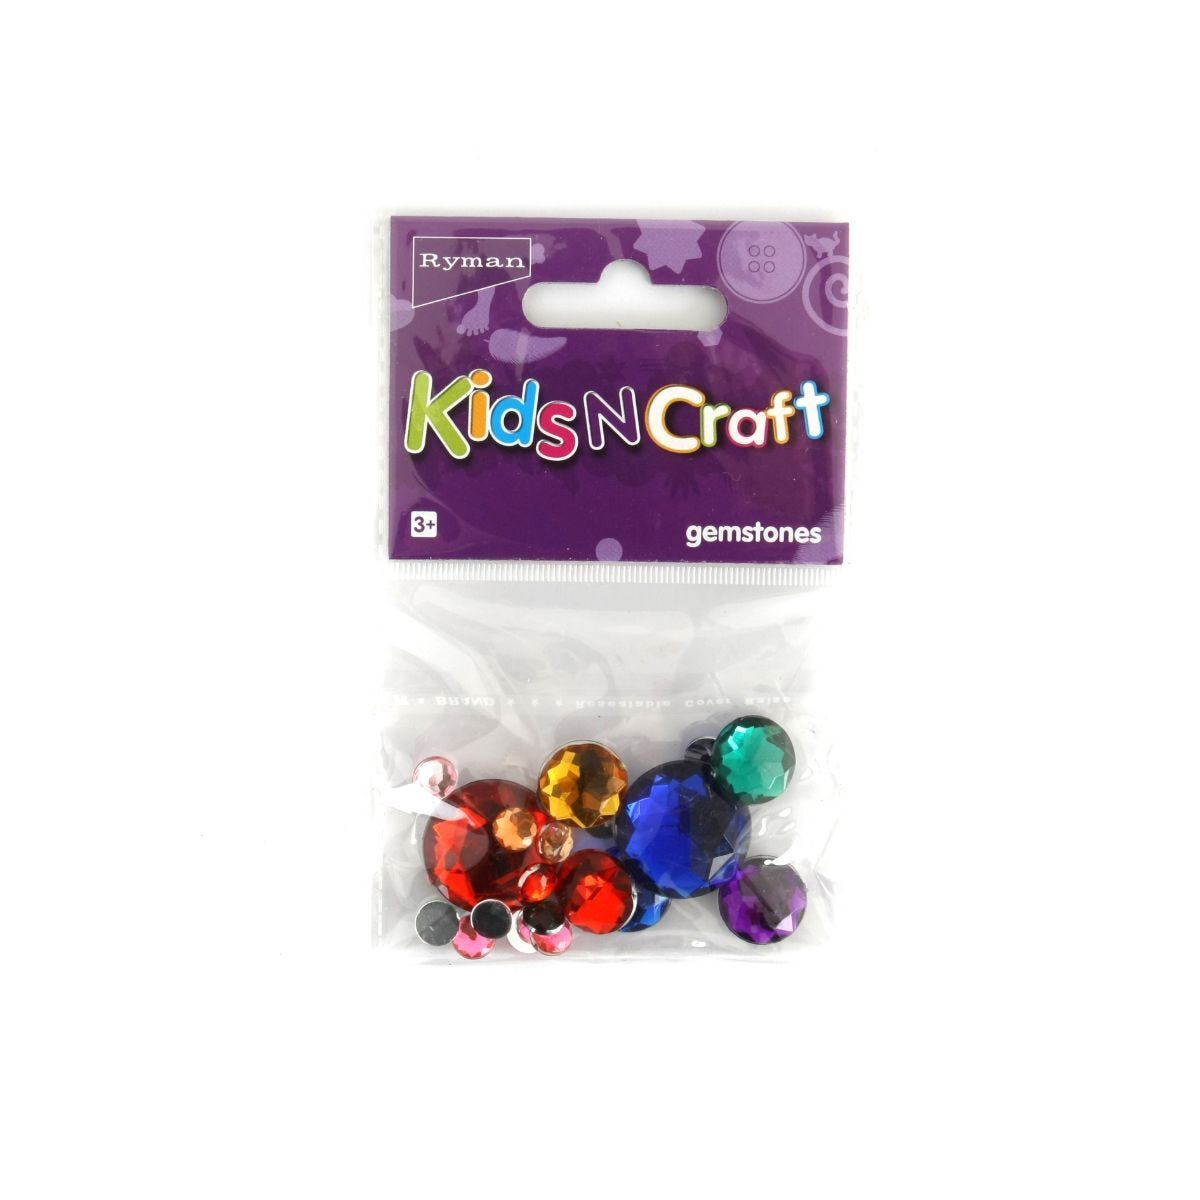 Ryman Activity Kit Gemstones